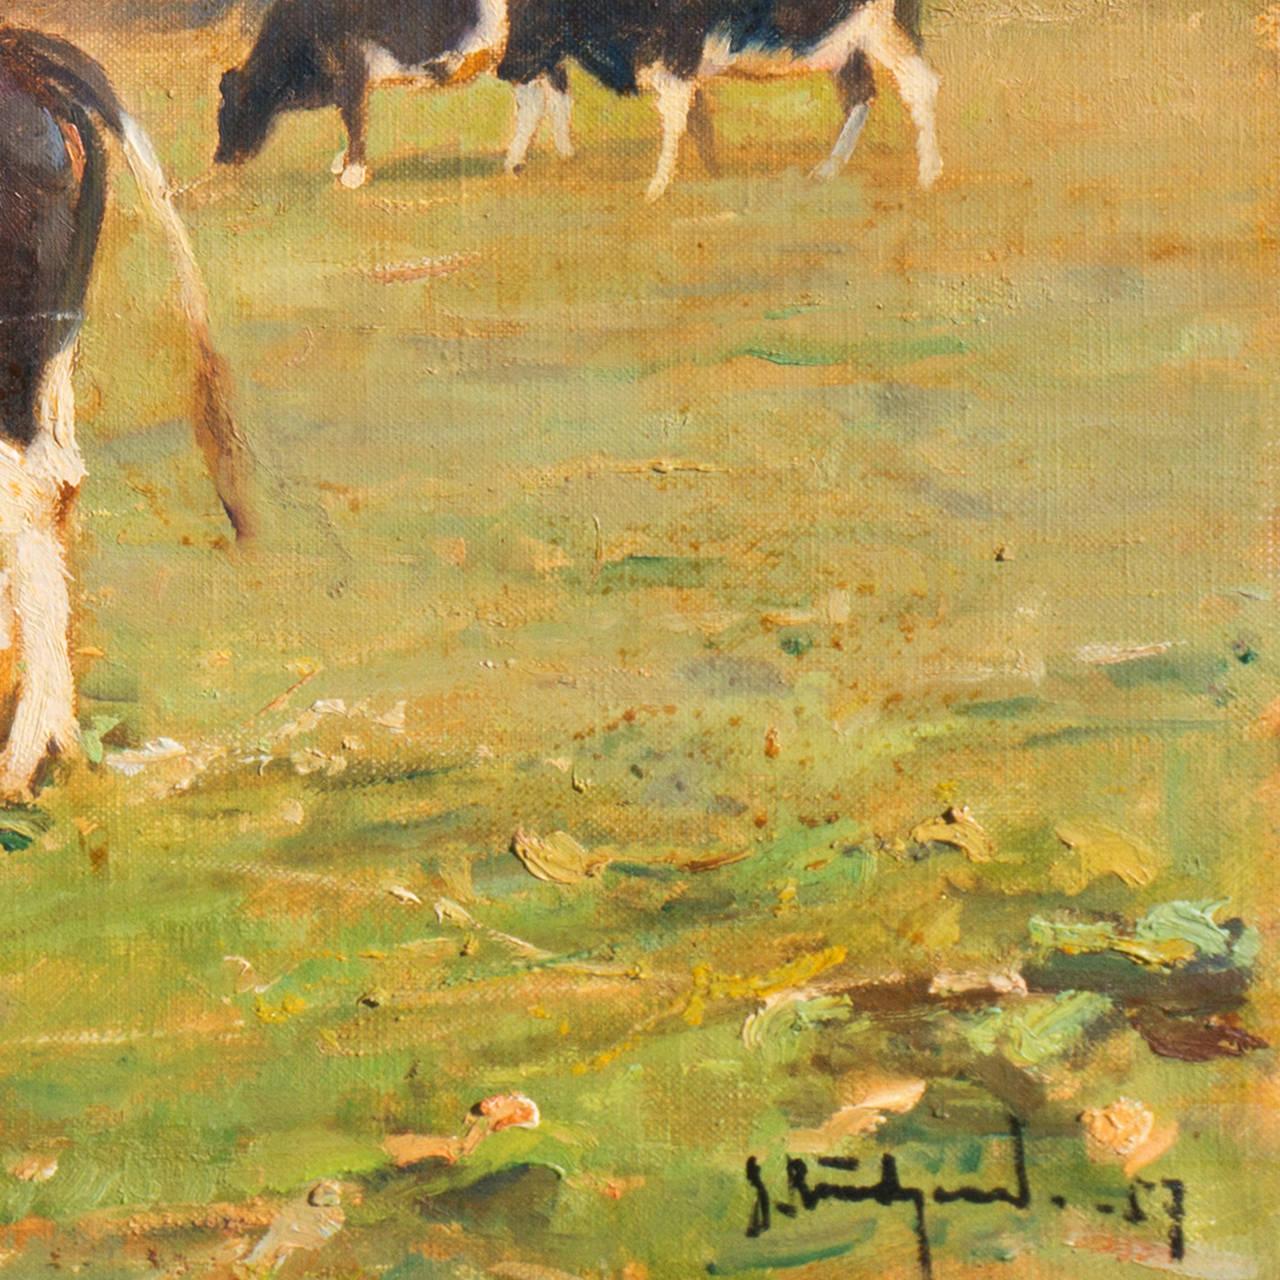 'Cattle at Pasture', Danish Impressionist Landscape oil, Paris, France  - Painting by Gunnar Bundgaard